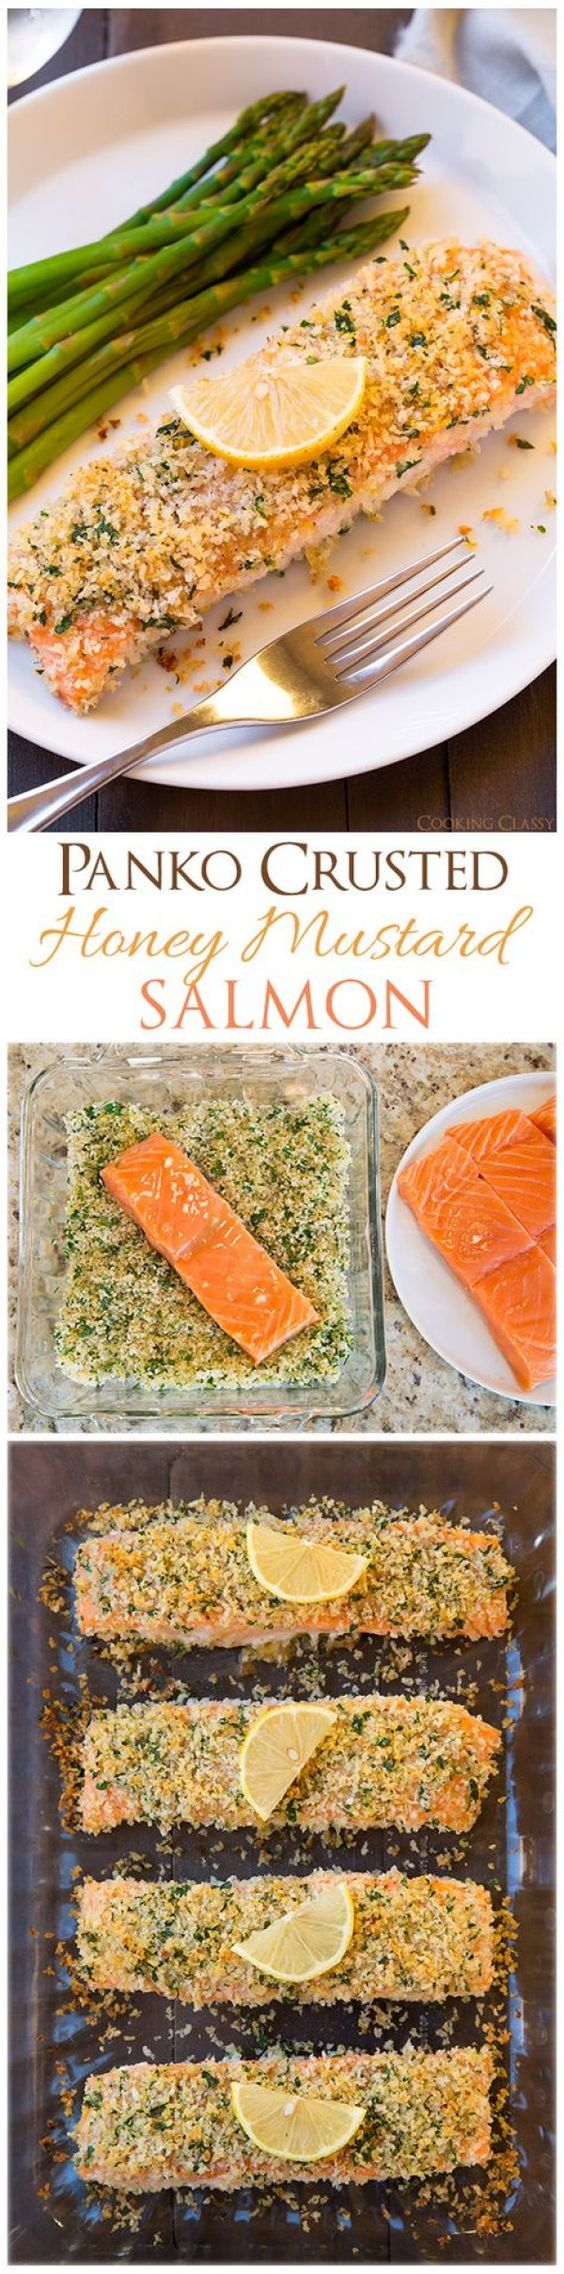 Get the recipe ♥ Panko Crusted Honey Mustard Salmon @recipes_to_go